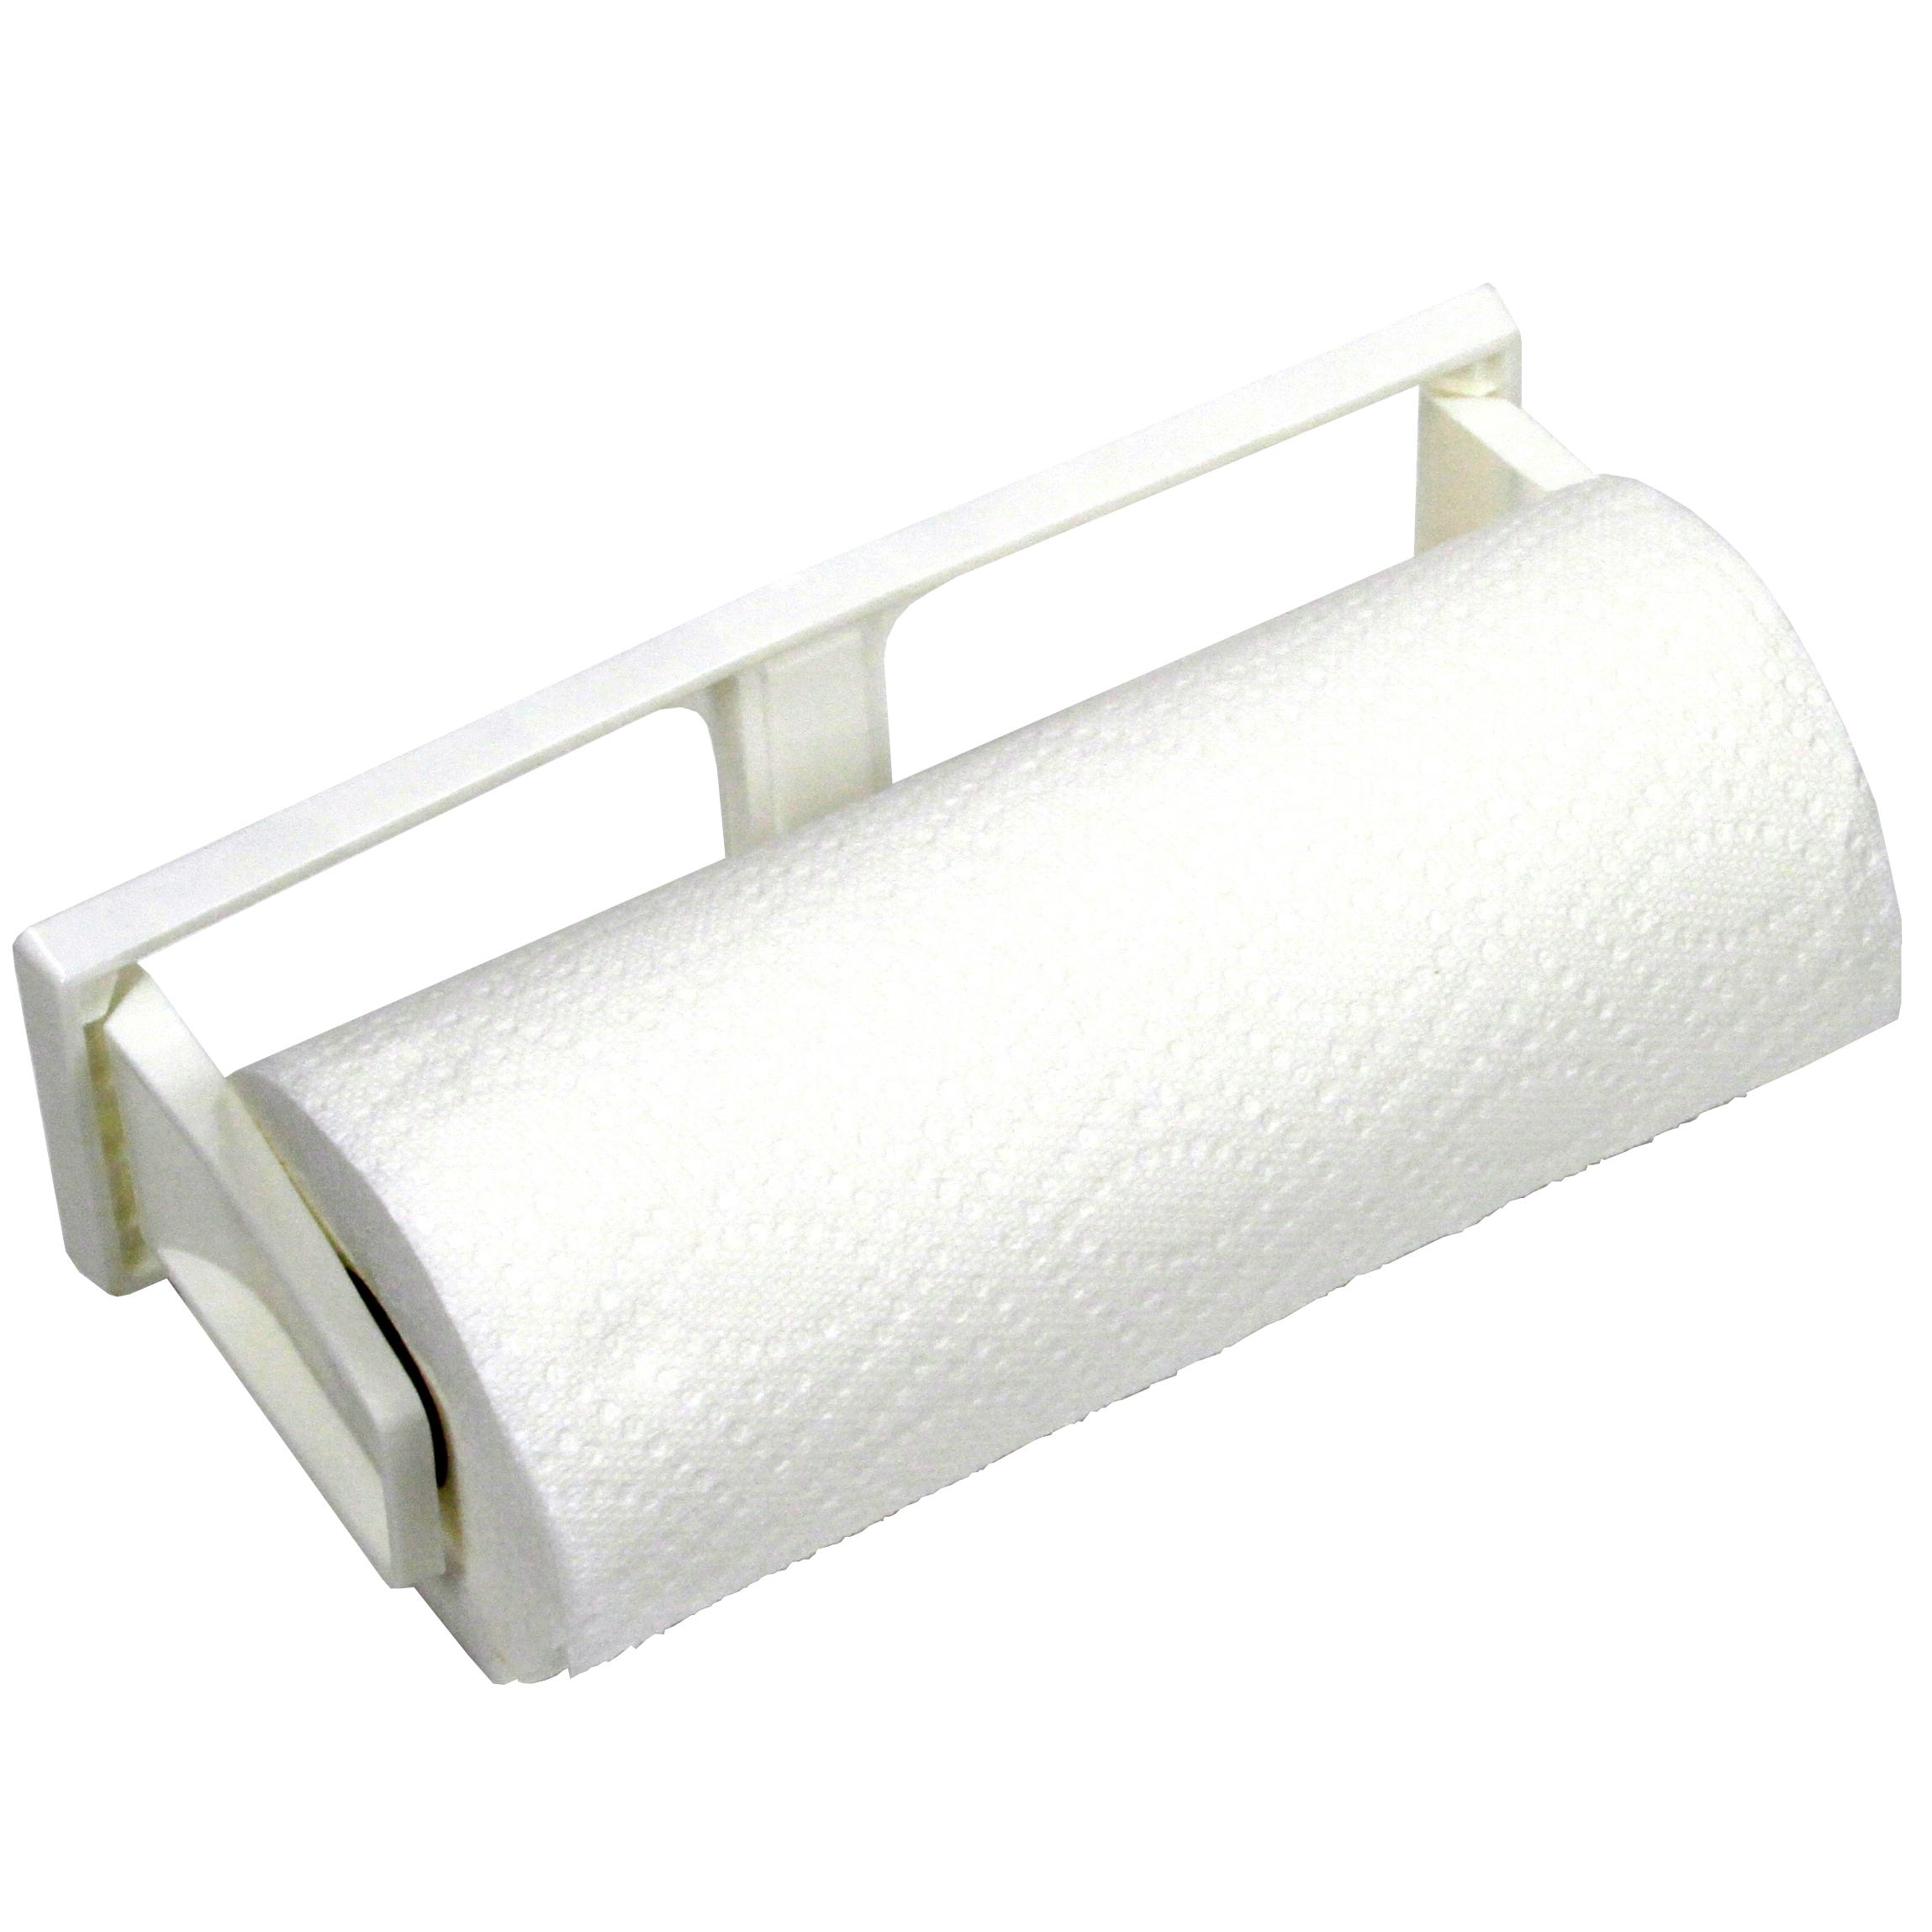 White Paper TOWEL Holders